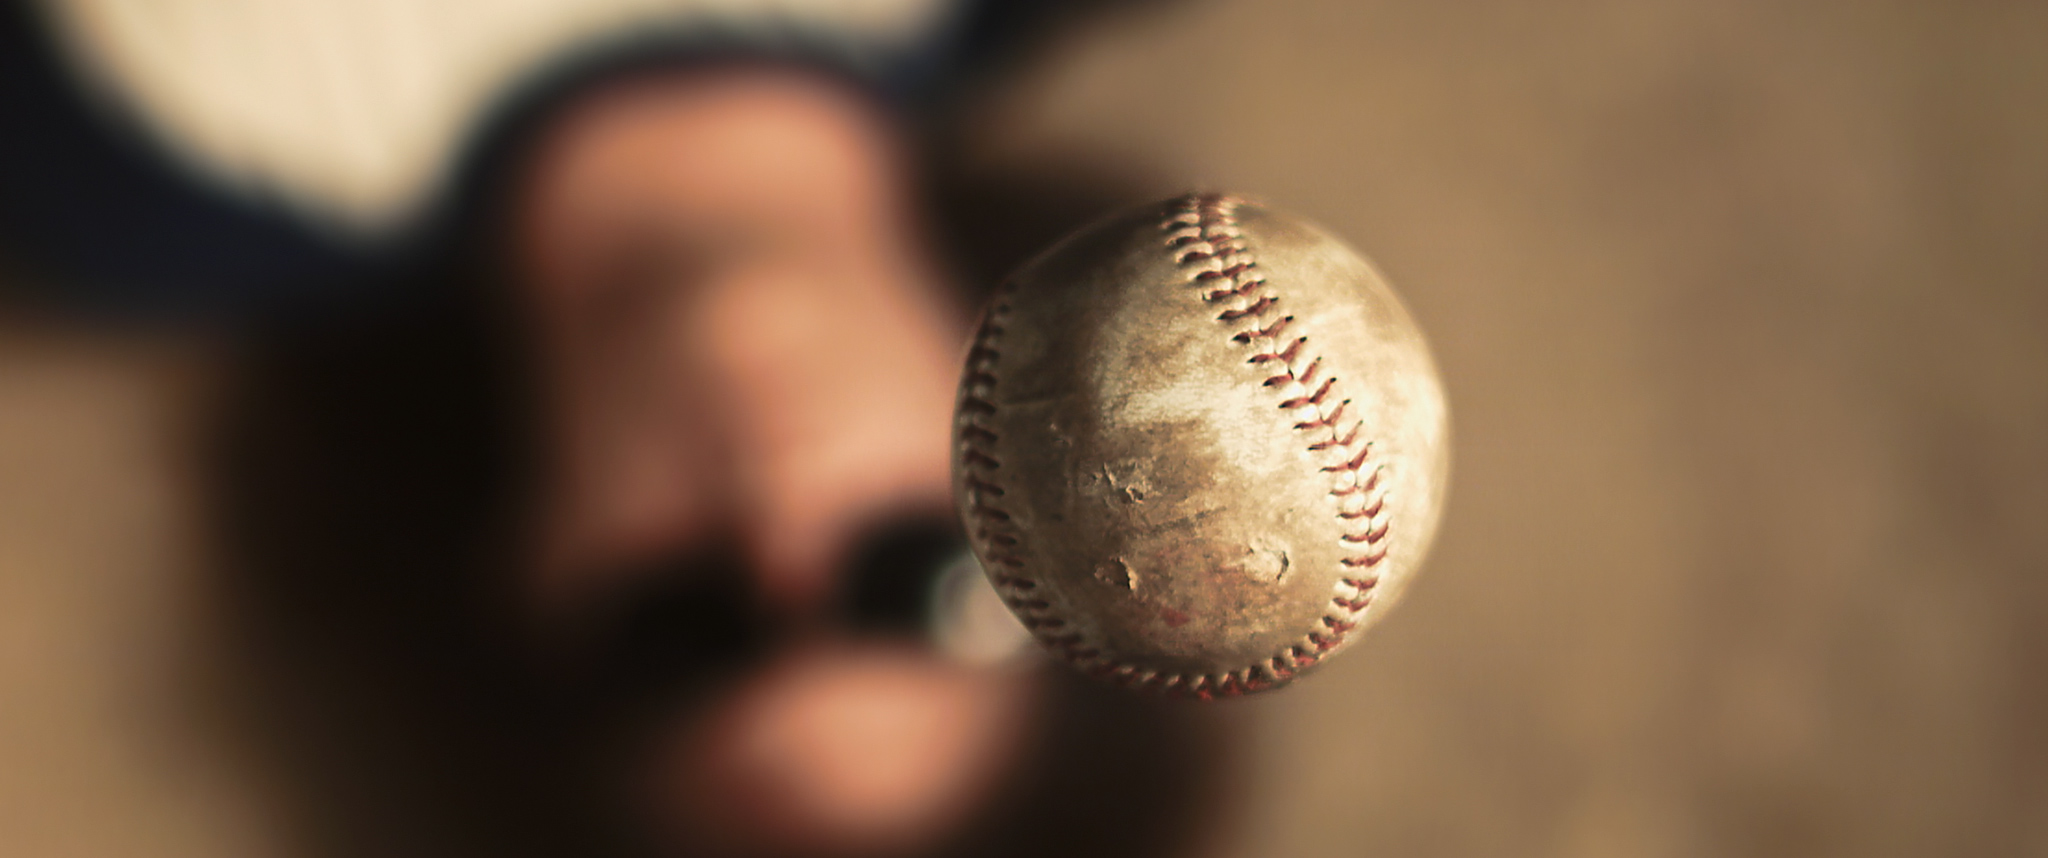 baseball air.jpg